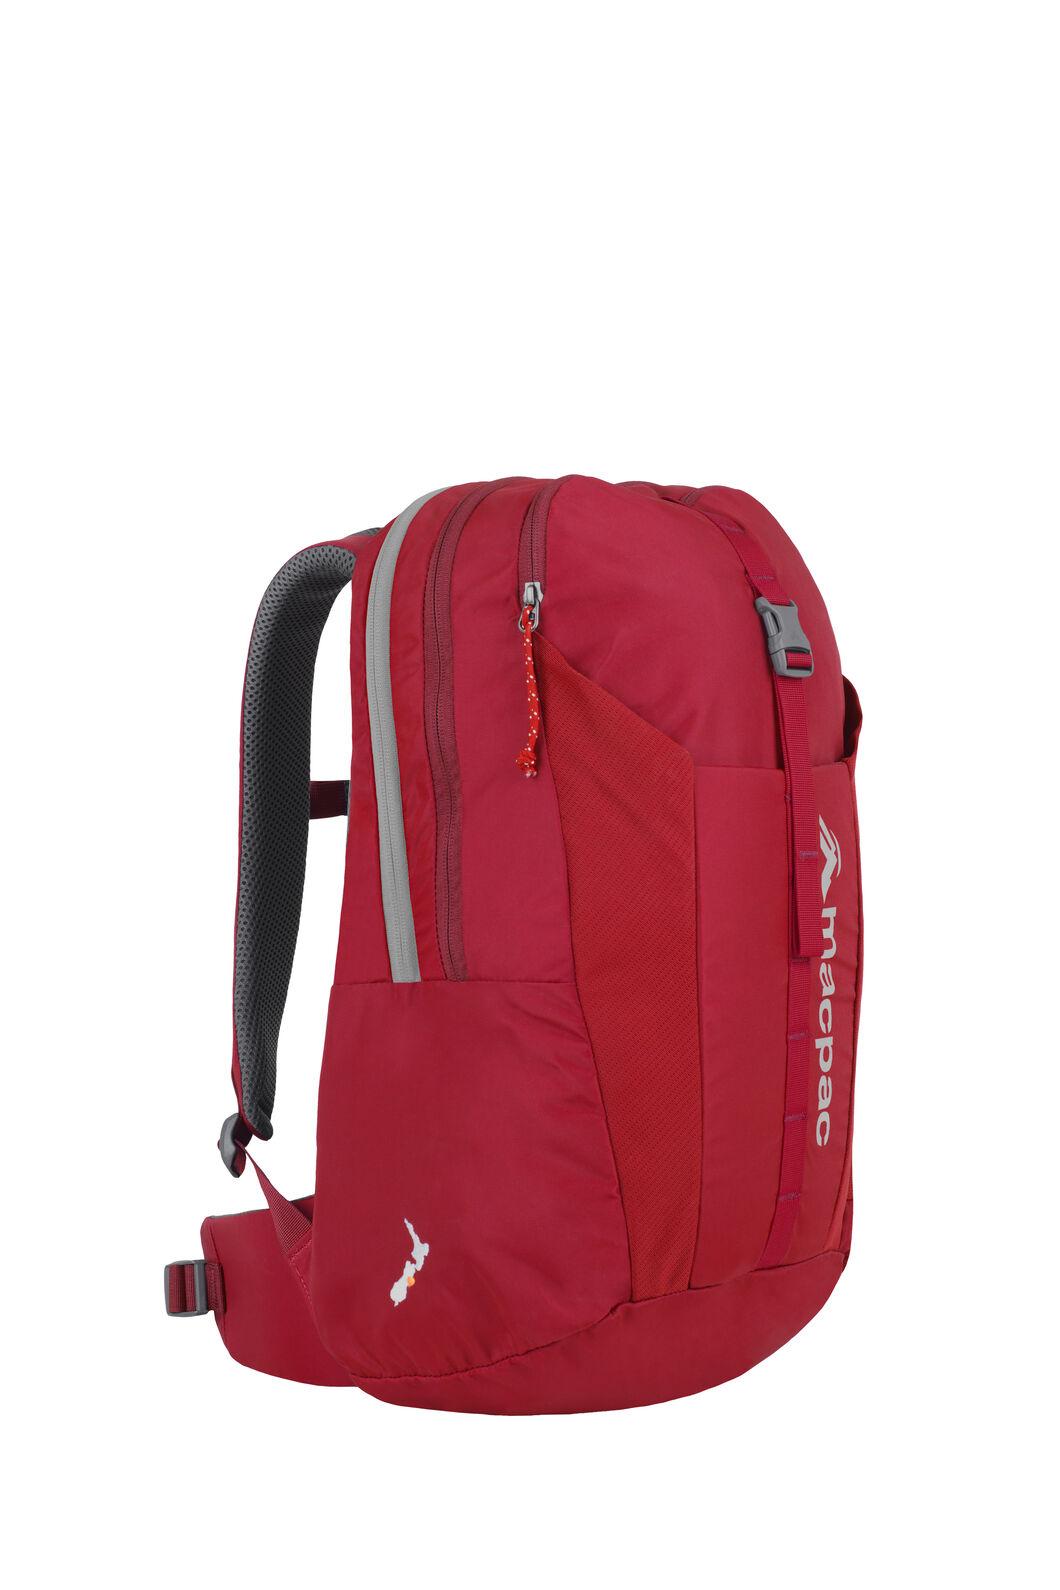 Macpac Summit Ridge 22L Backpack — Kids', Haute Red, hi-res